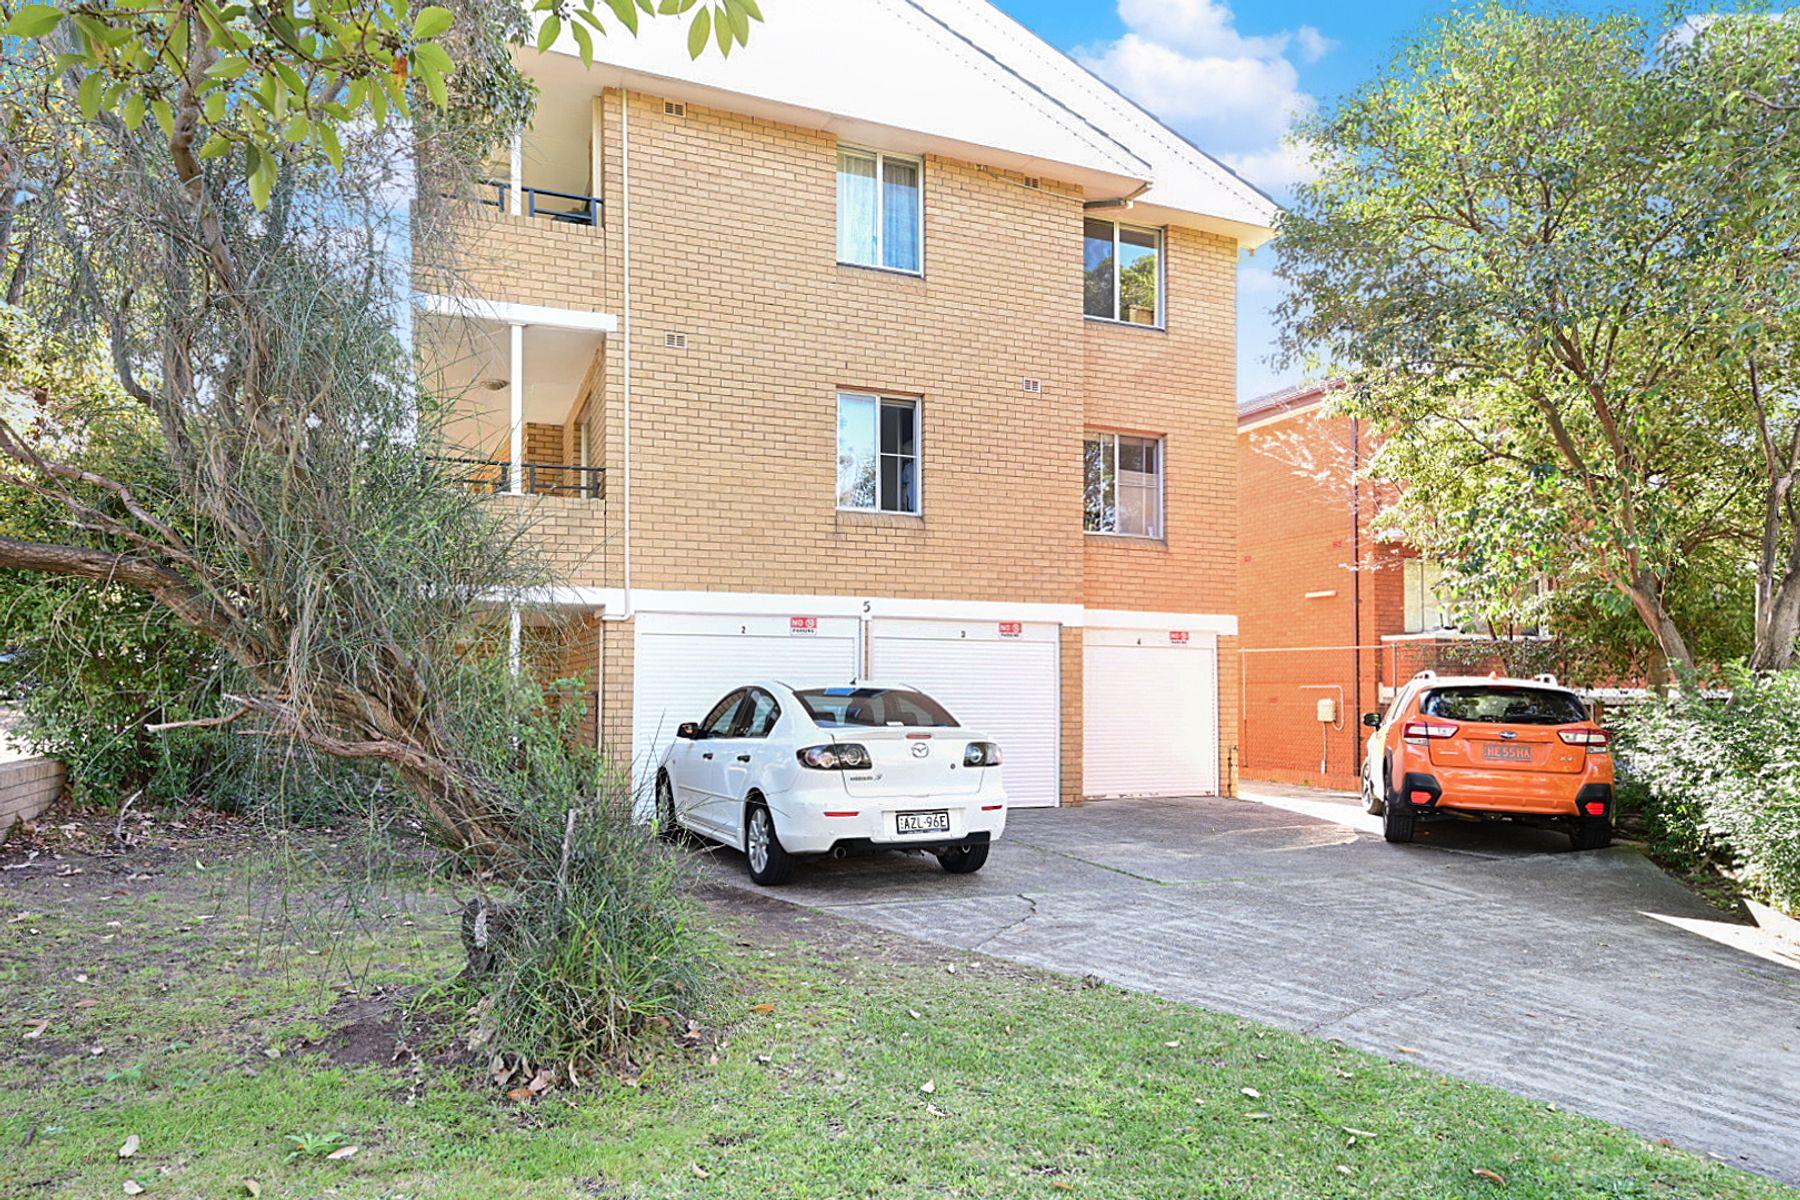 3/5 Homebush Road, Strathfield, NSW 2135